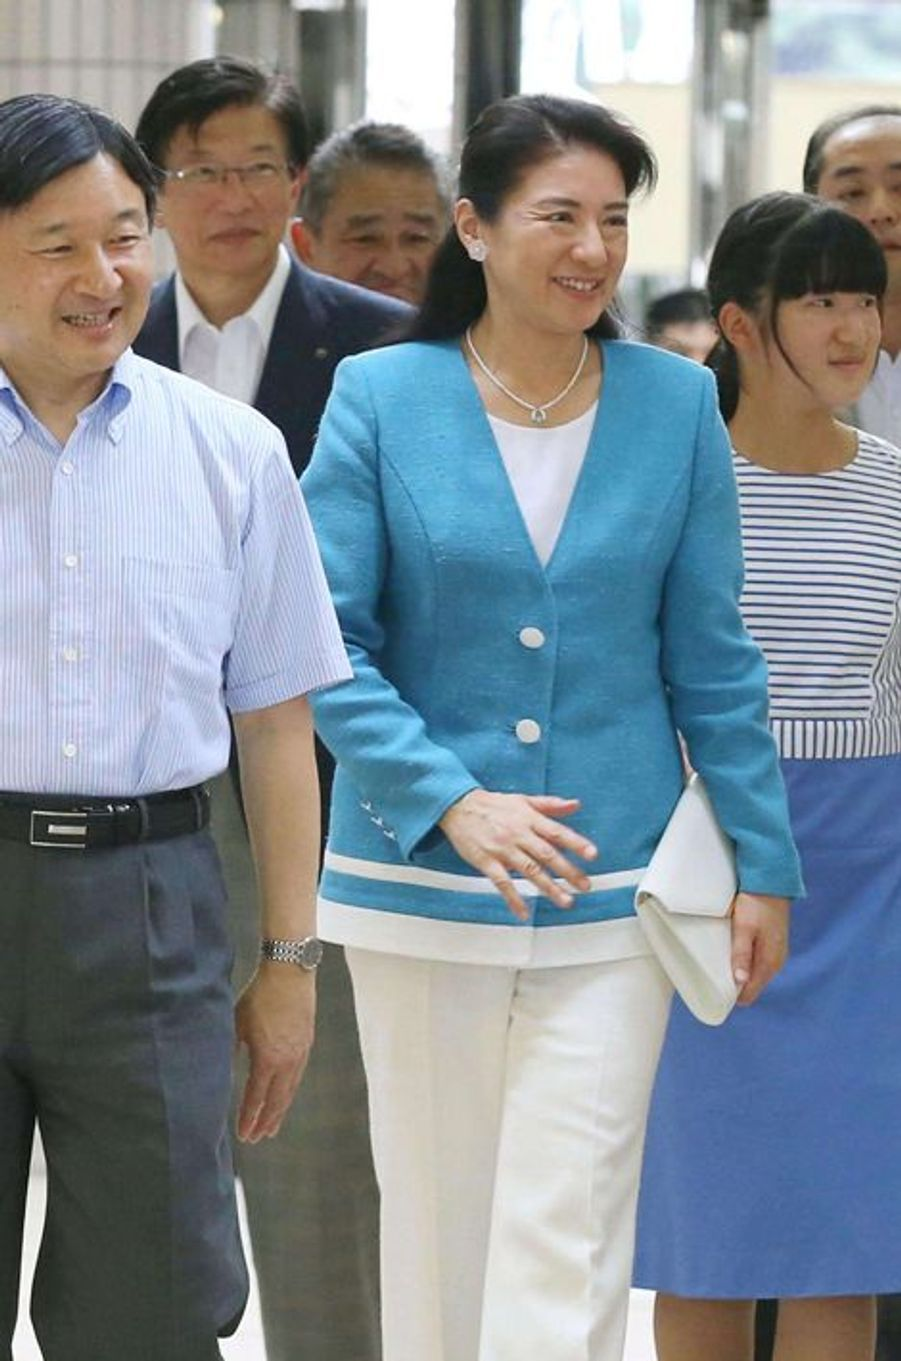 Les princesses Masako et Aiko et le prince Naruhito à la gare de Izukyu-Shimoda, le 11 août 2015